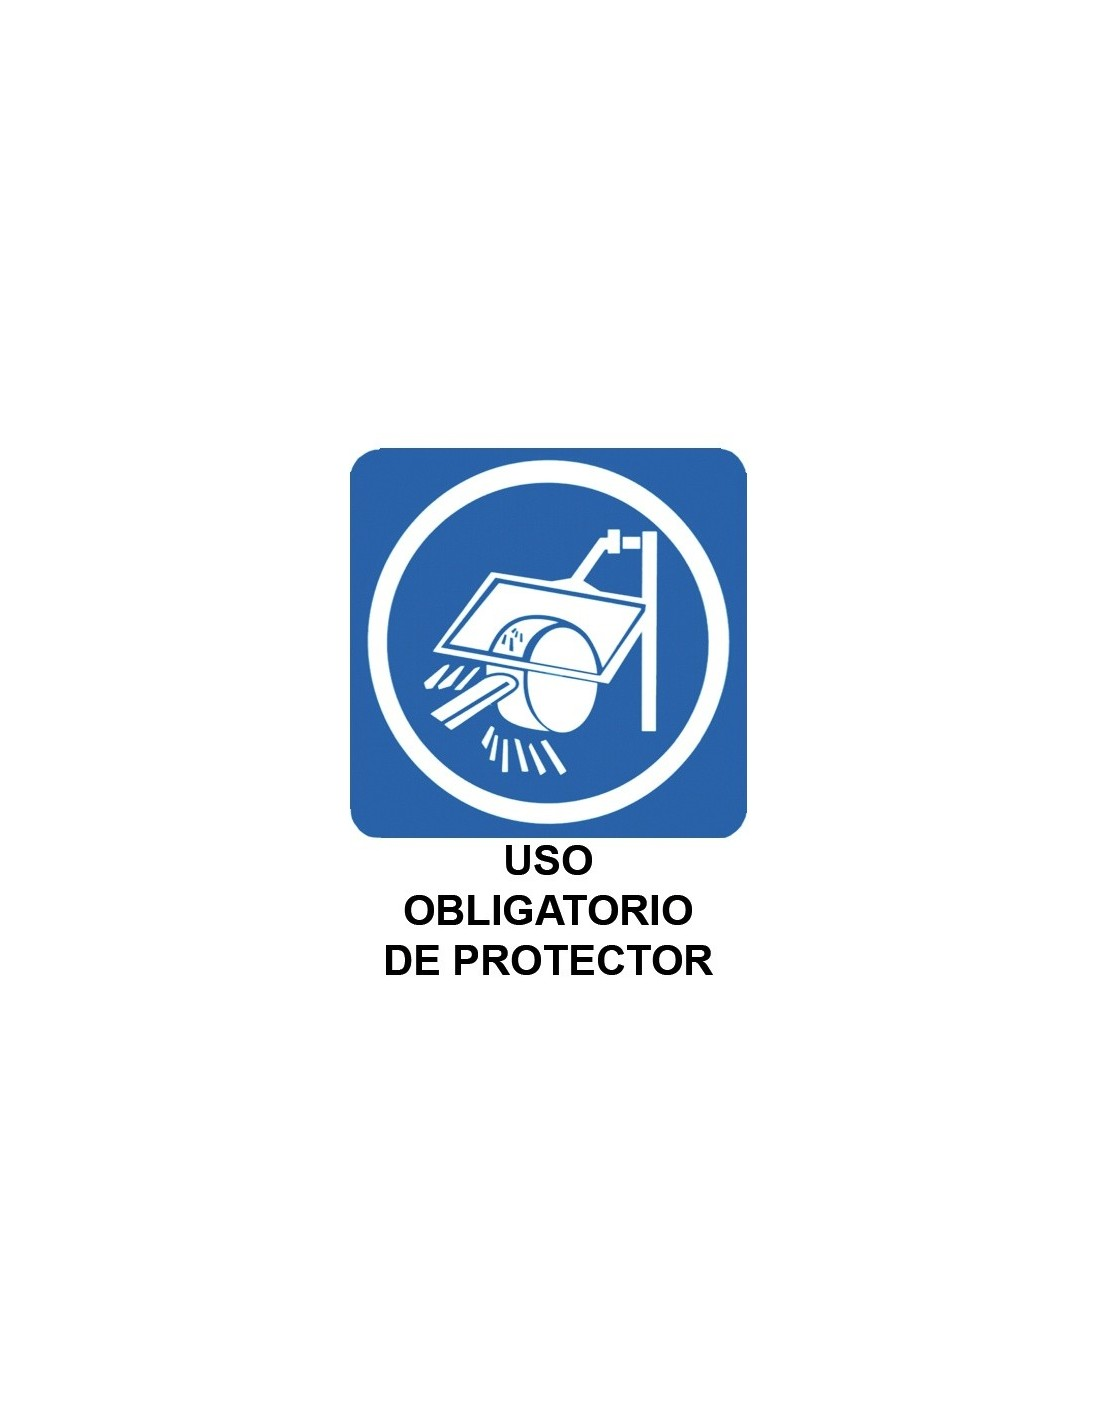 Cartel PVC 40x30 Uso obligatorio de protector auditivo